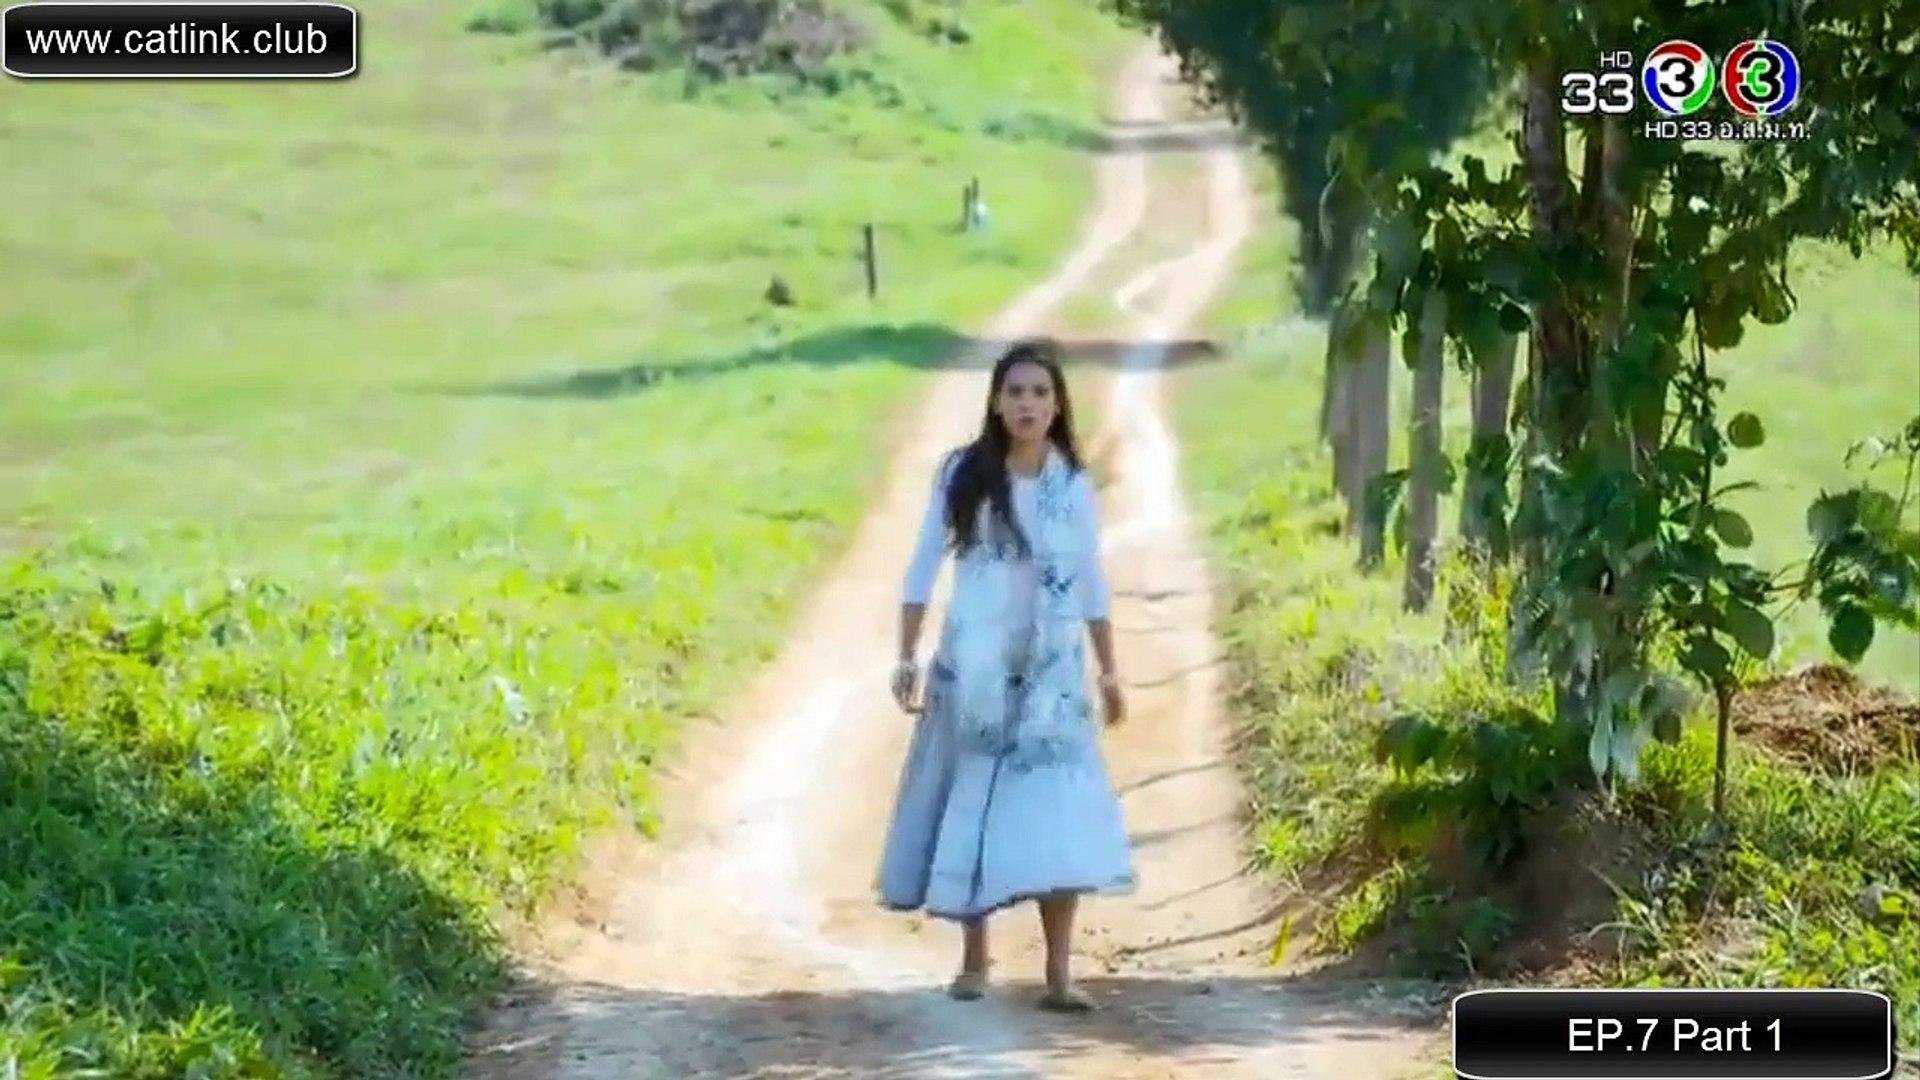 [ENG SUB] ลิขิตรัก The Crown Princess EP 7 Part 1 English Subtitles Thai  Drama 2018 - Likit Ruk EP 7 Eng Sub